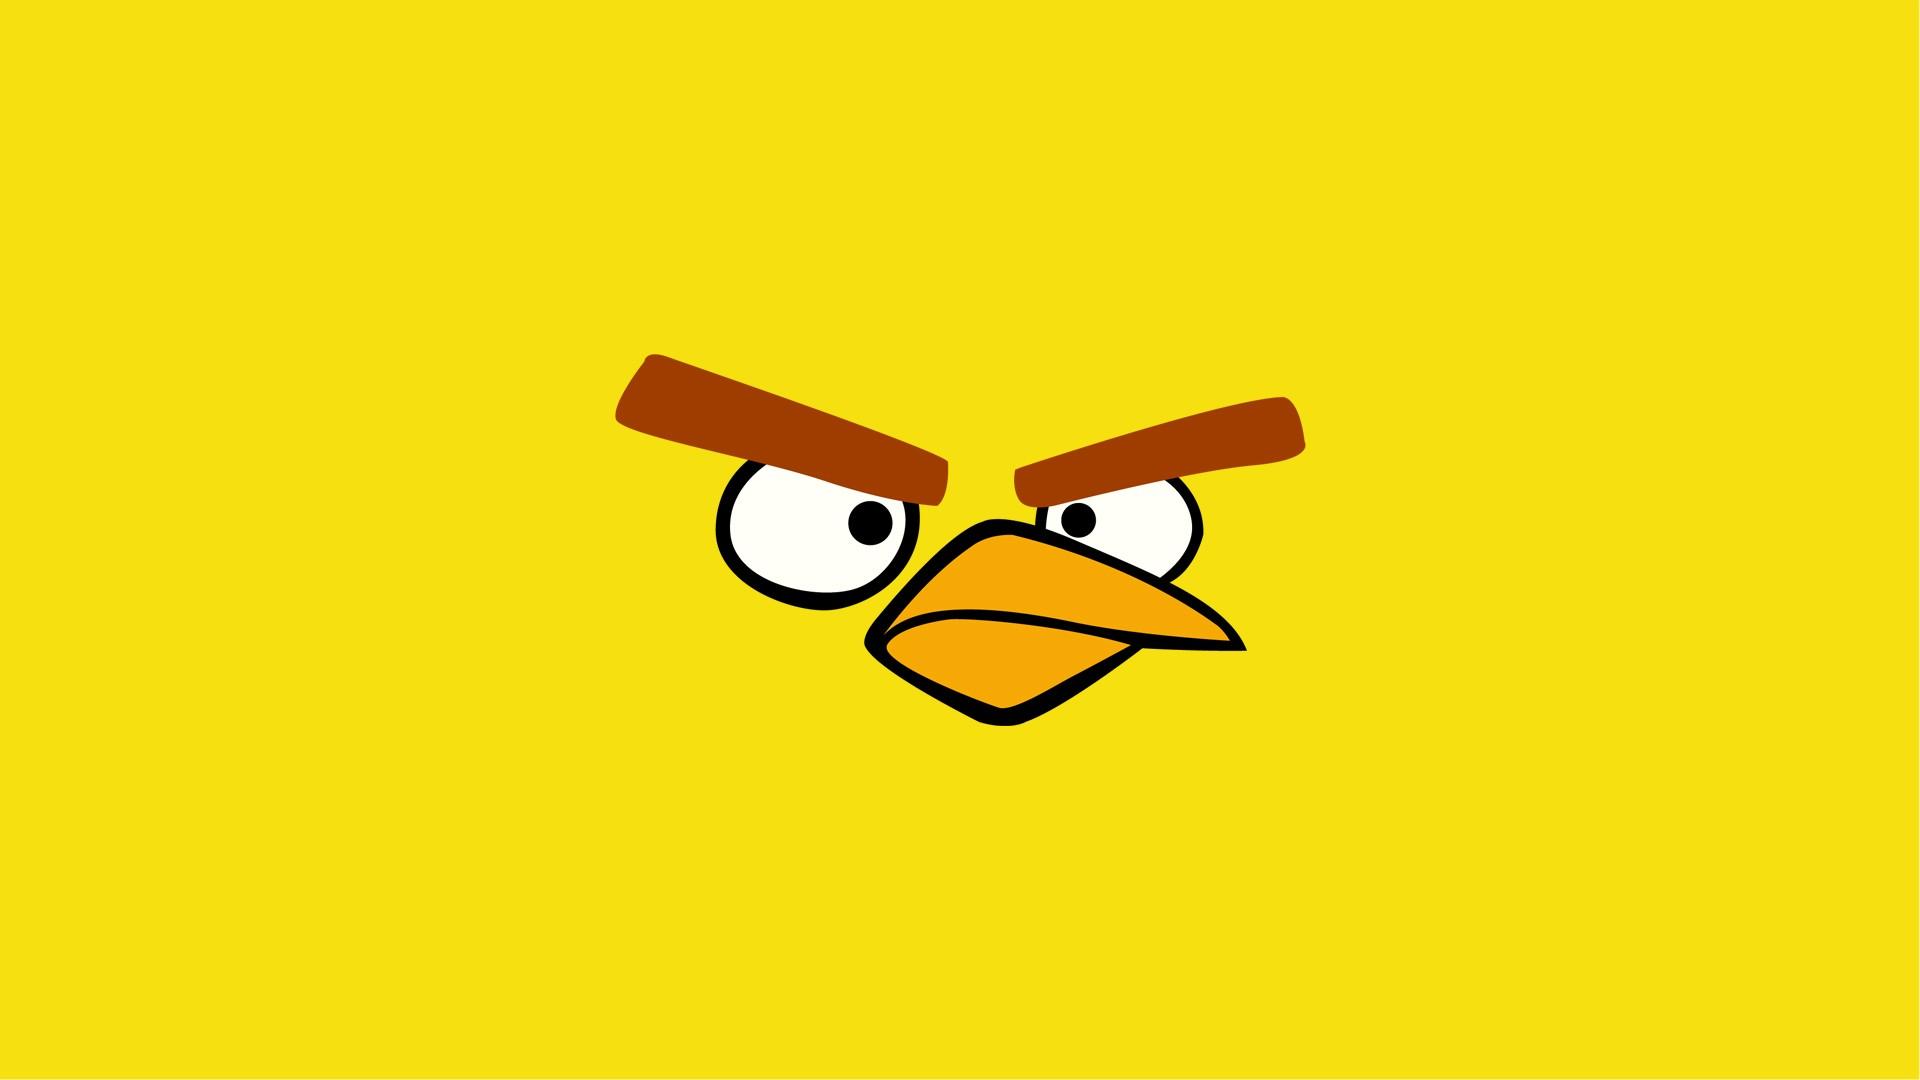 yellow angry bird wallpaper 30396